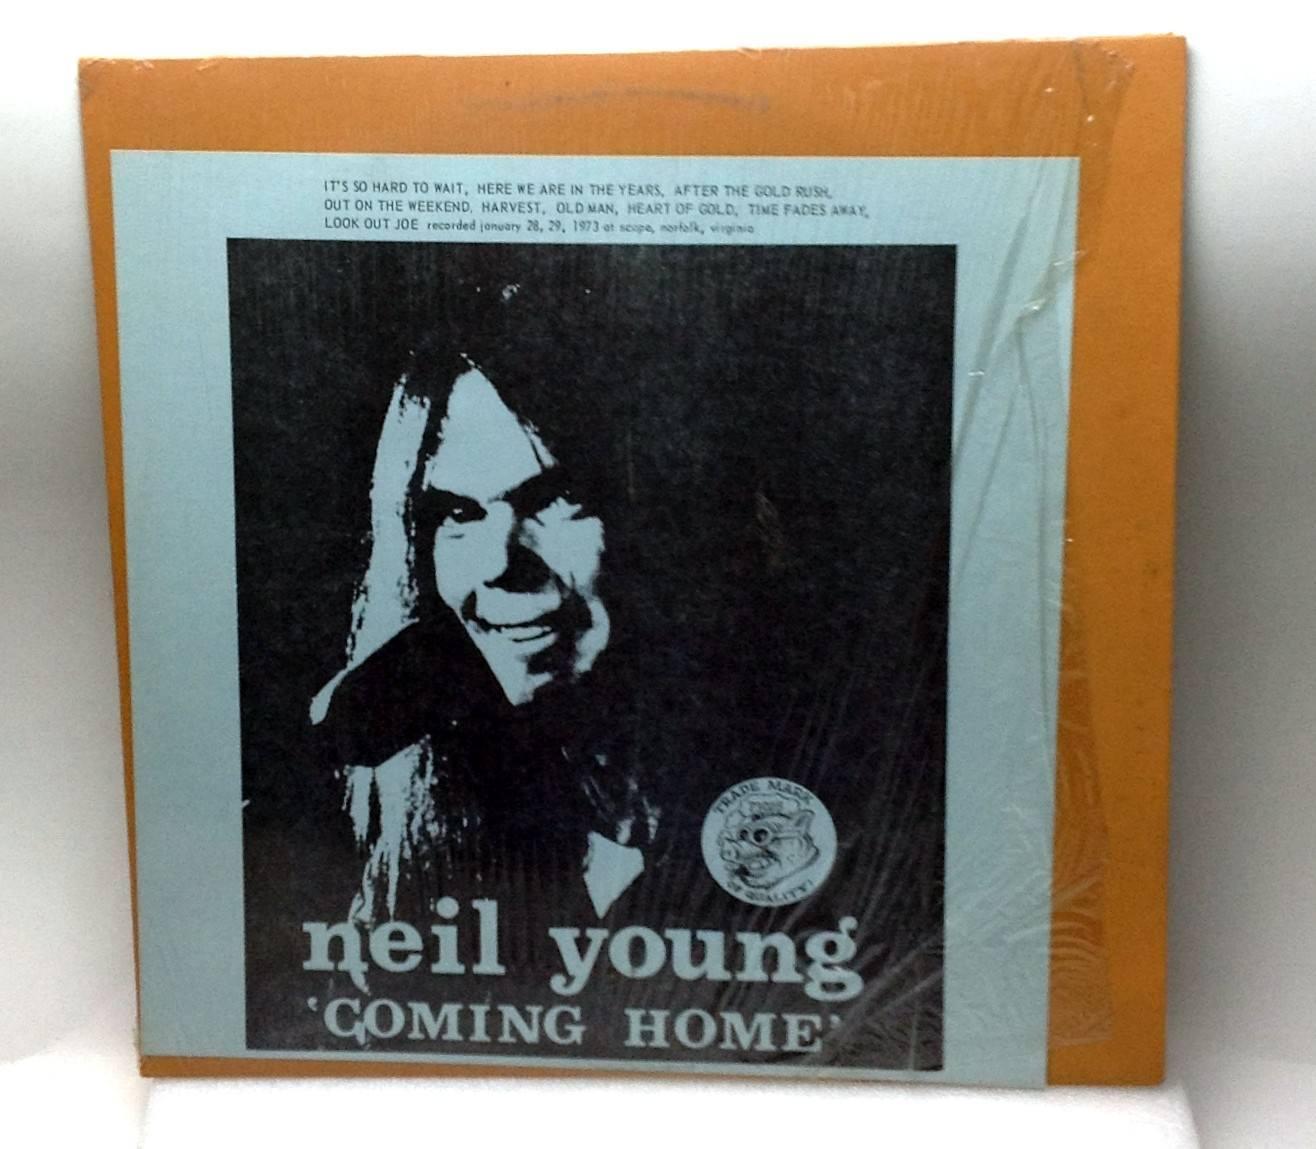 Neil Young Coming Home Live 29/1/1973 Vinyl LP Record TMOQ 1881 Rare VG++/NM